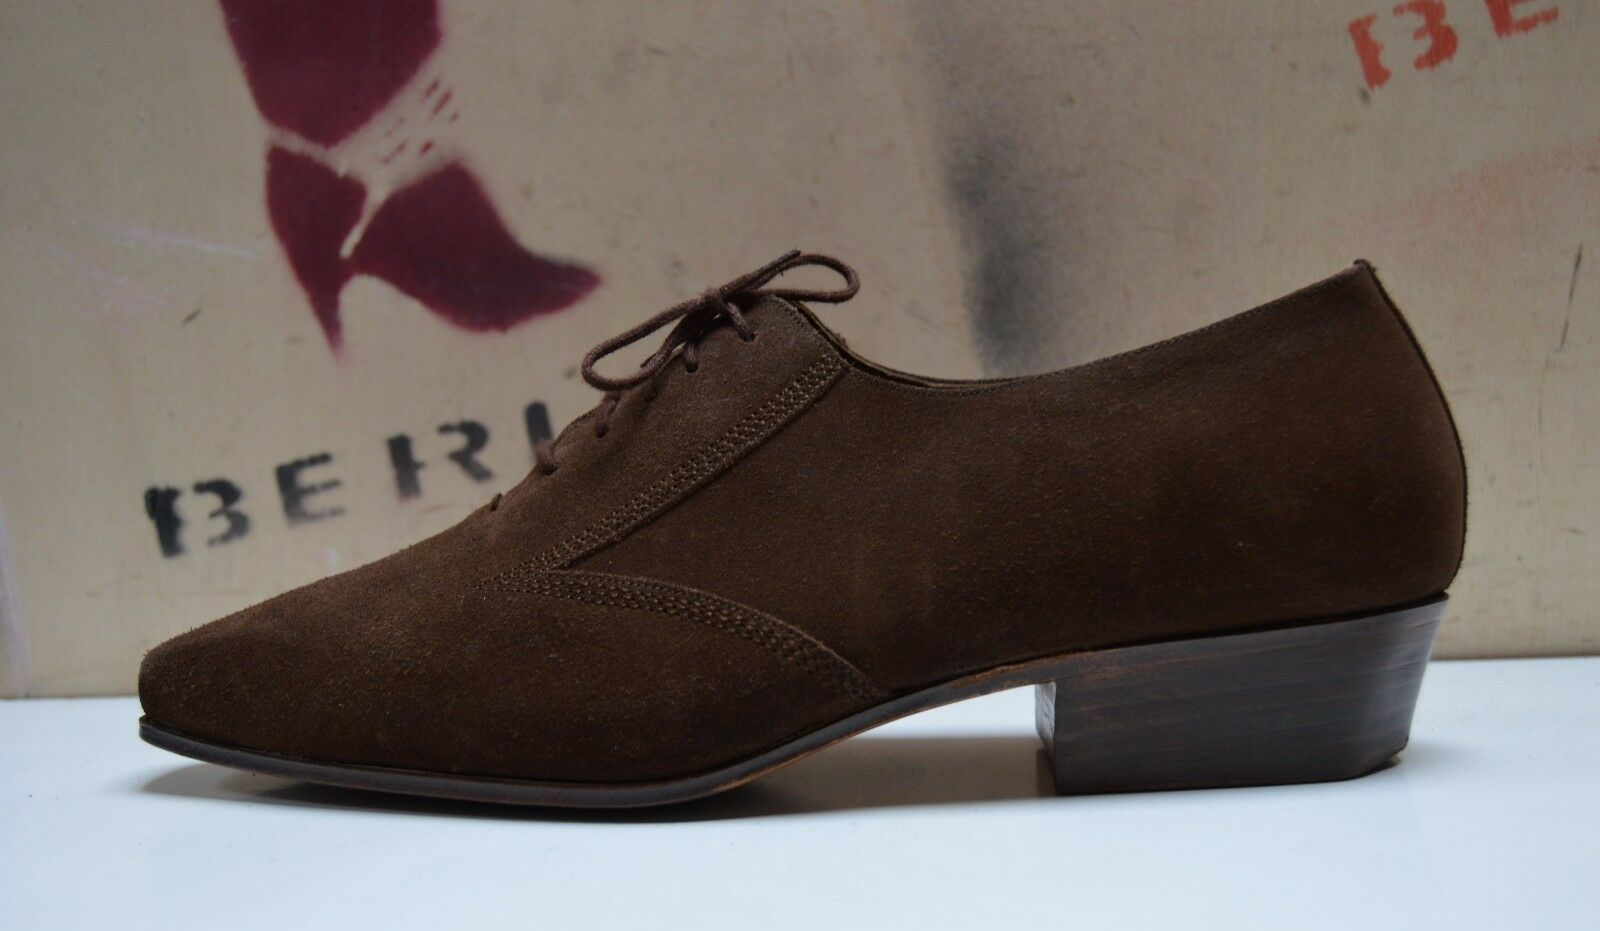 Hommes Chaussures Basses Chaussure Lacée 70er true vintage 70´s Marron rauhleder handmade